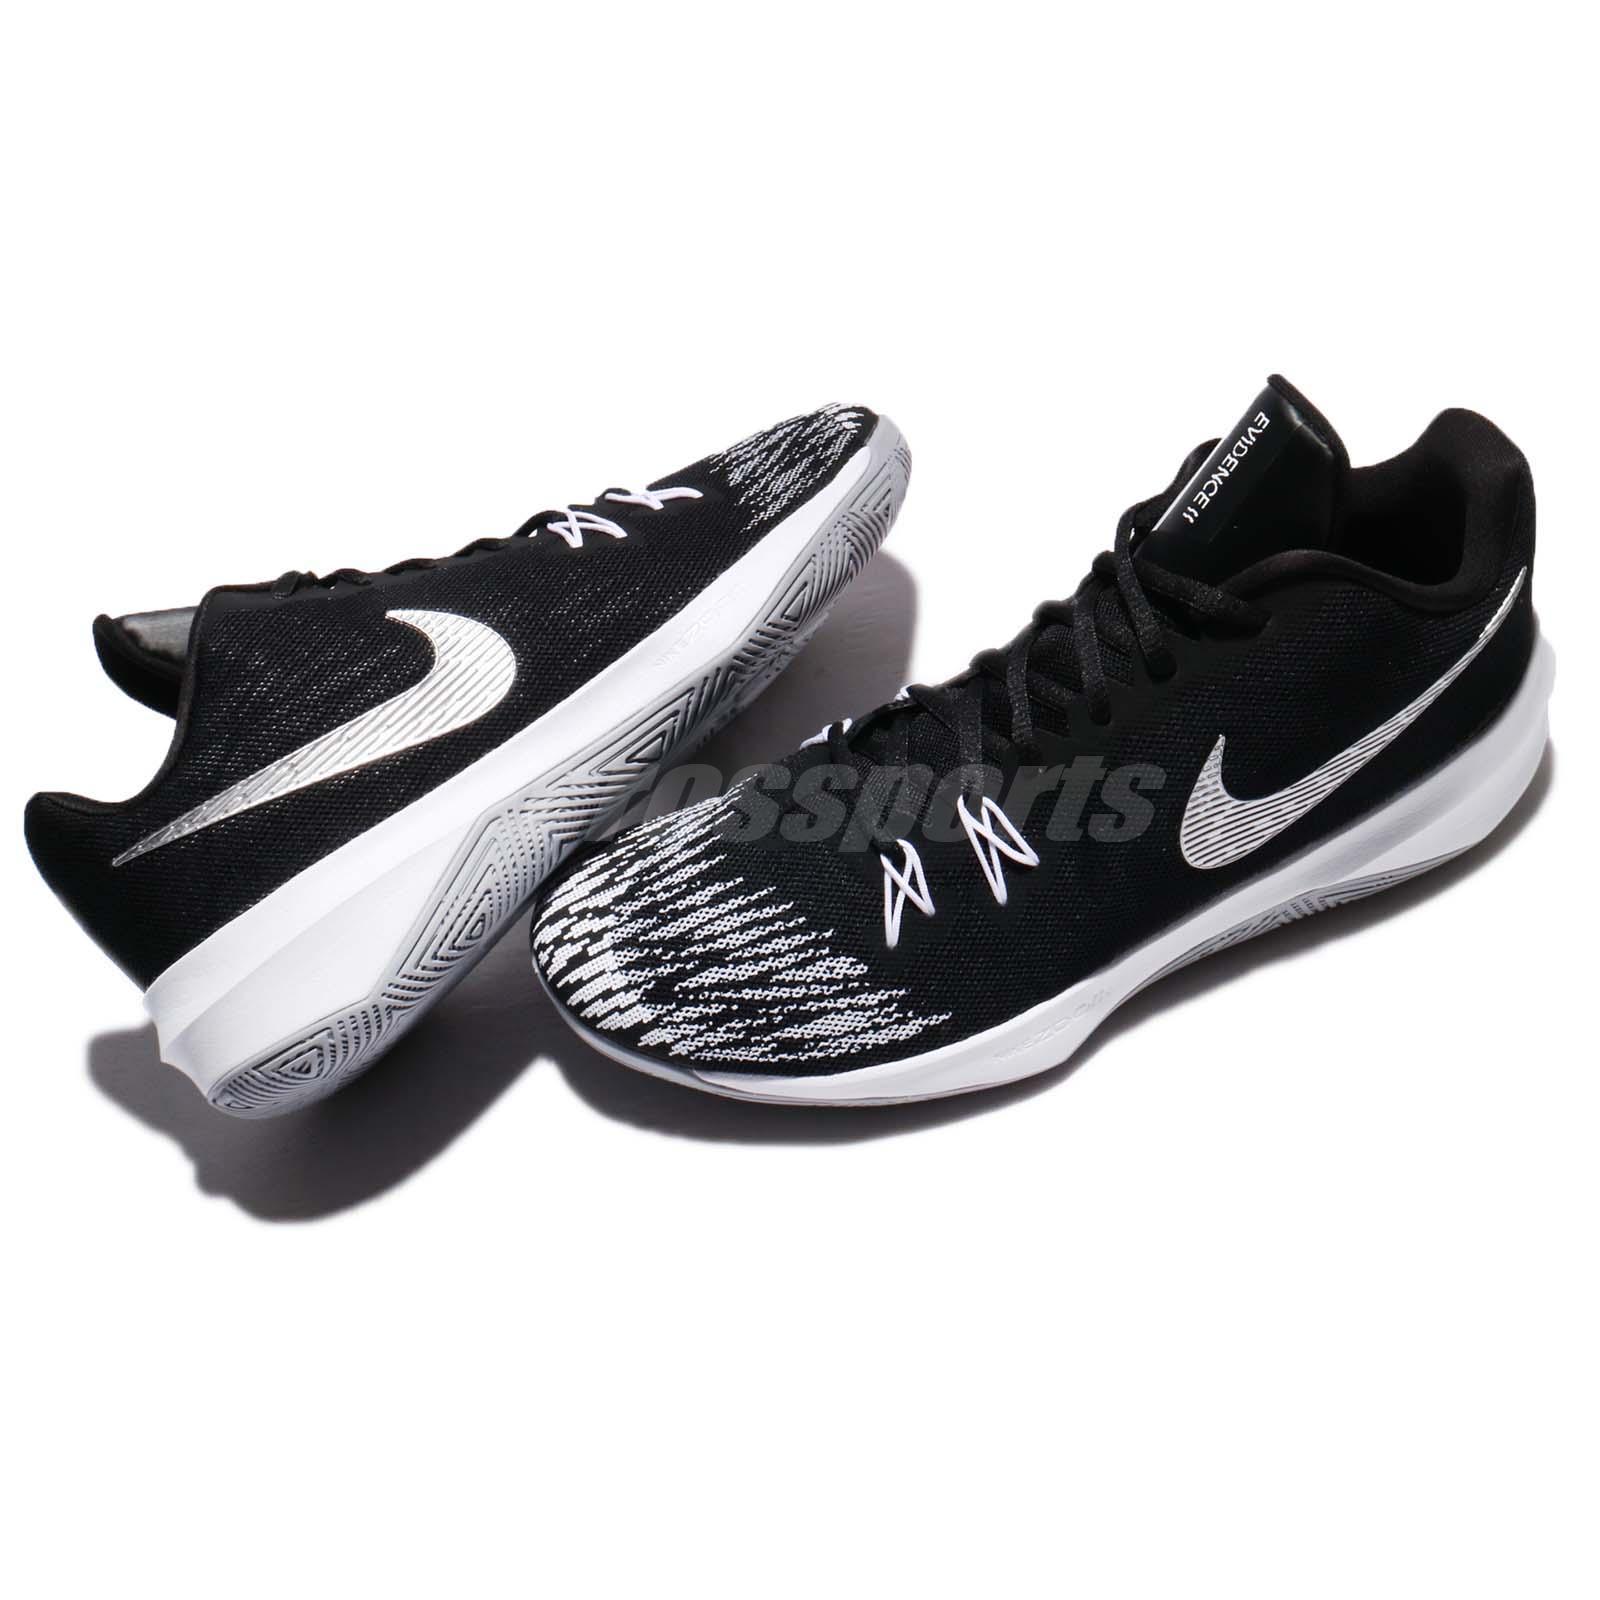 9c471b90c5b6 Nike Zoom Evidence II 2 EP Black Metallic Silver White Men ...